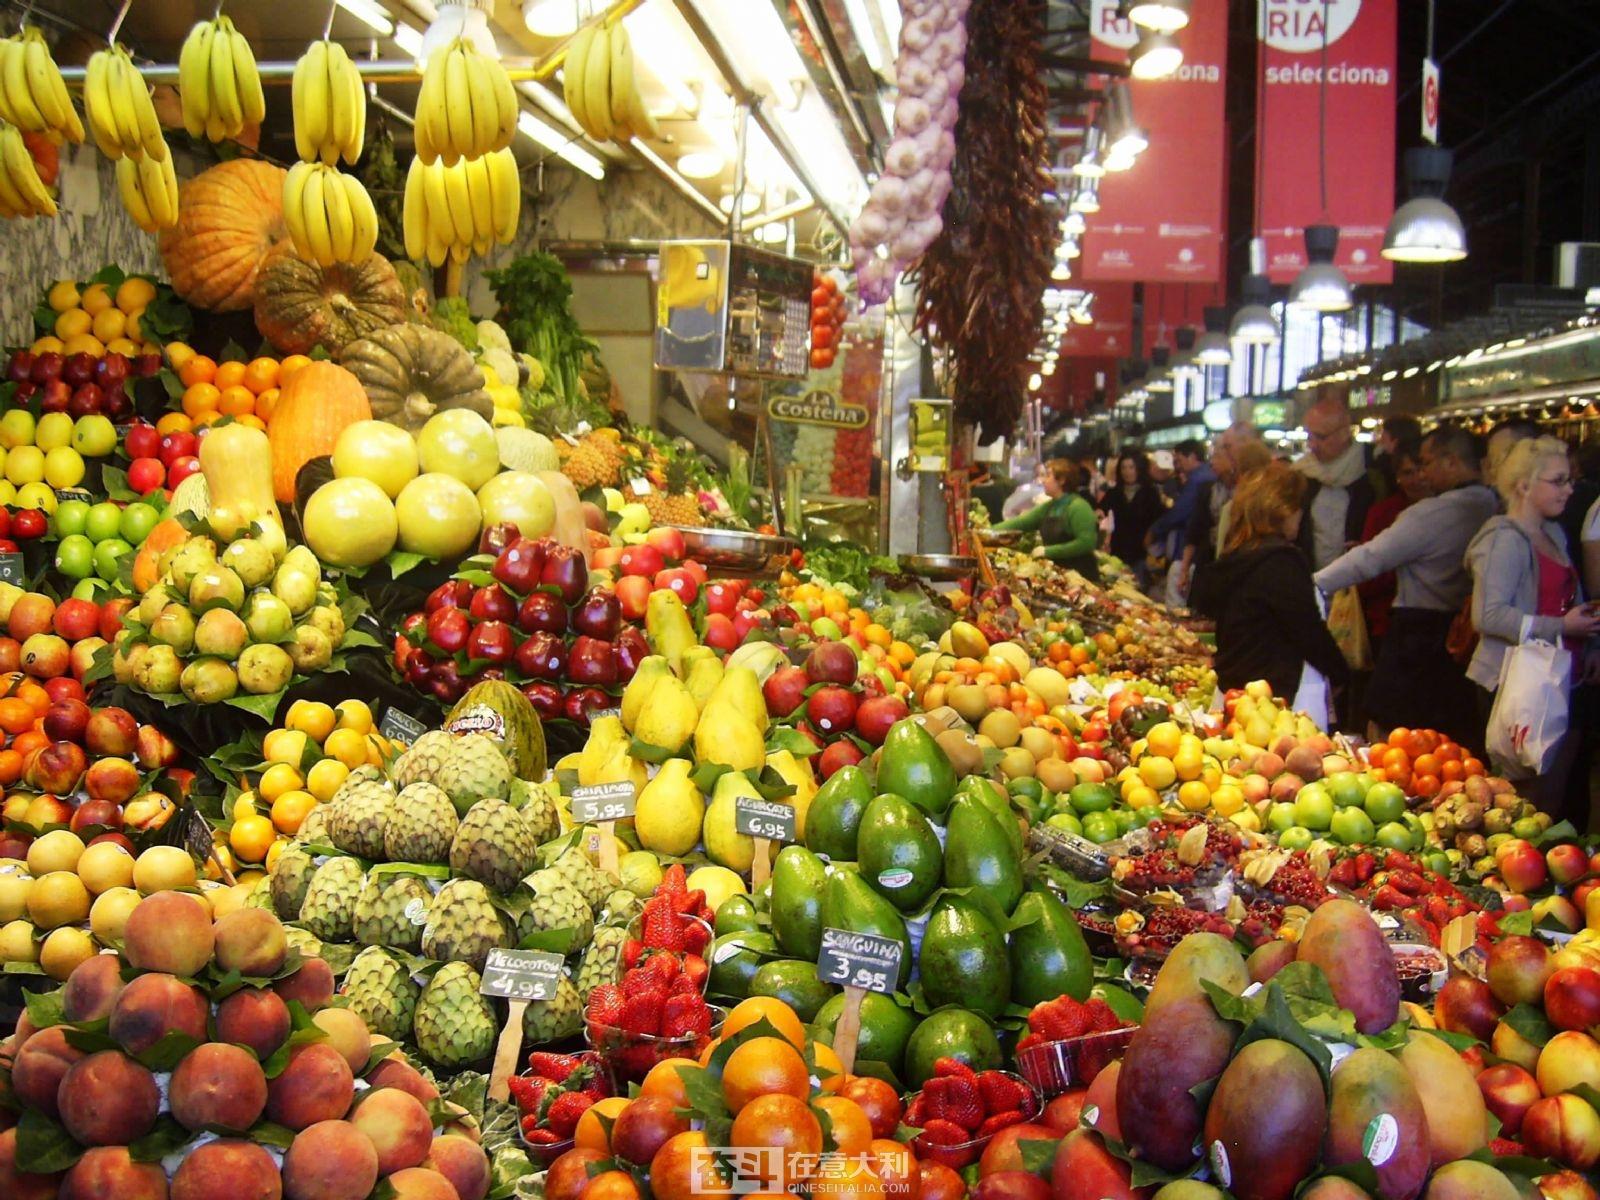 mercati-della-terra-3.jpg